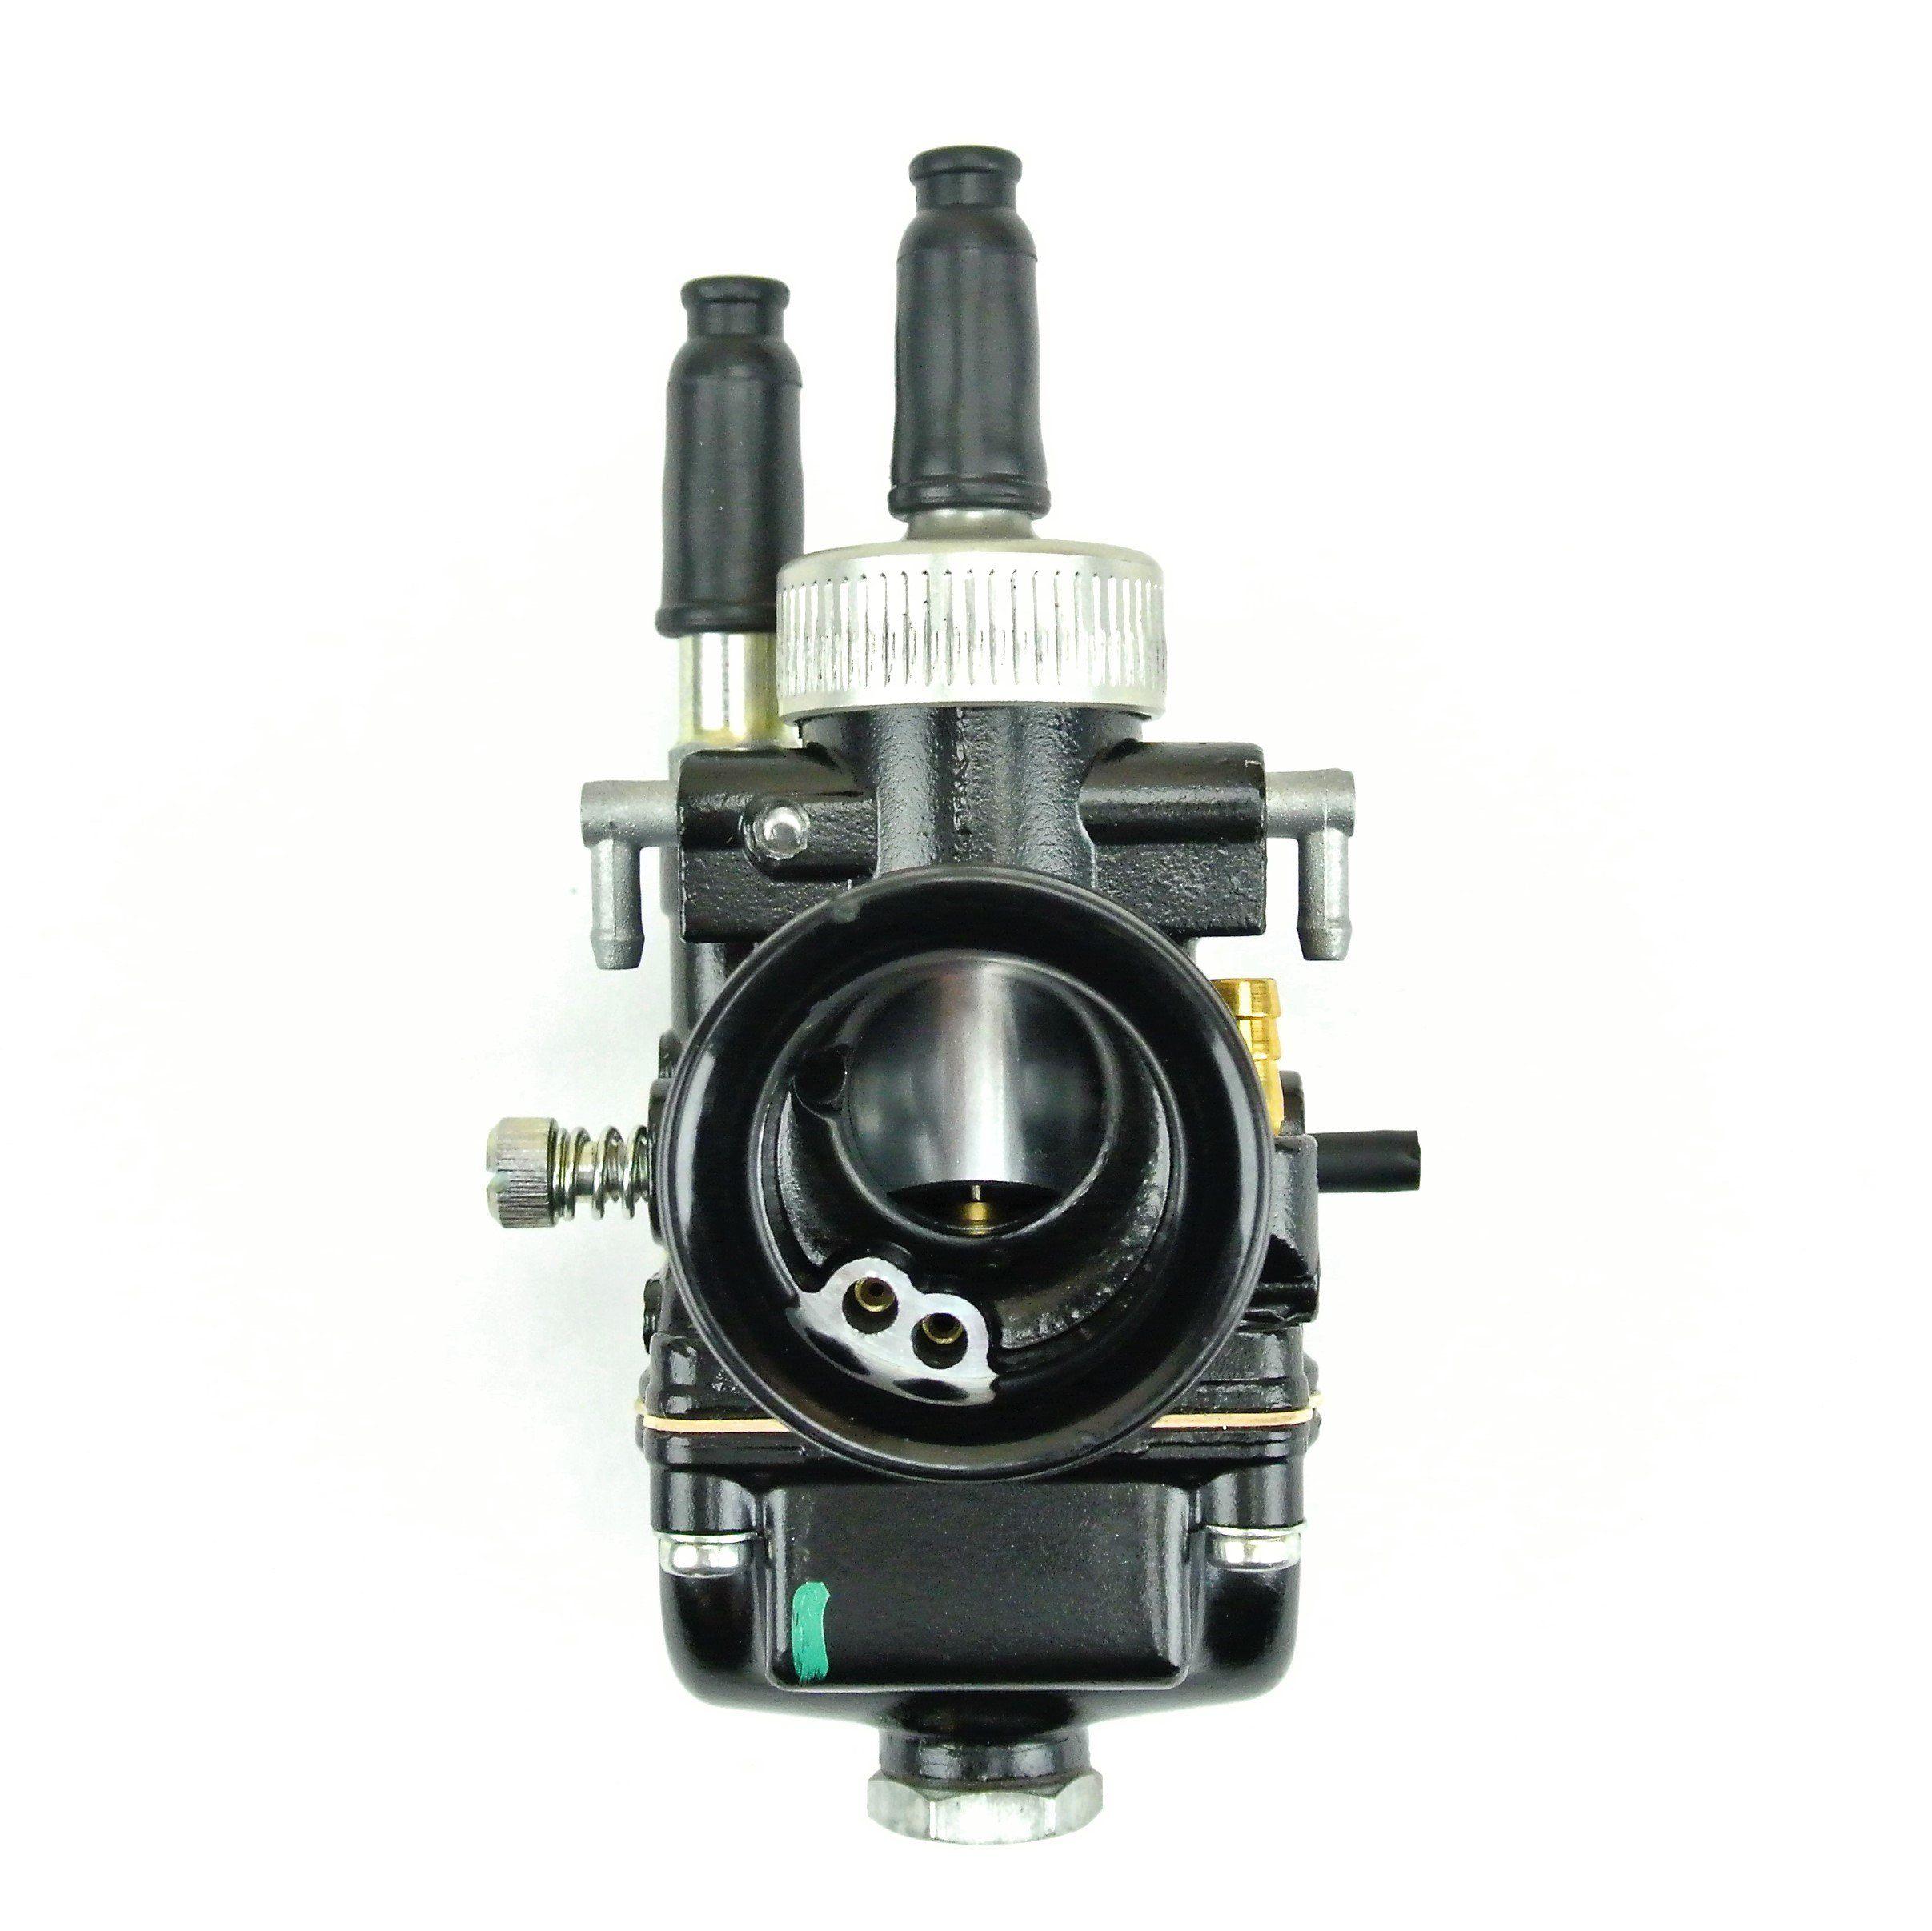 Dellorto PHBG 19 DS Race Carburetor | Products